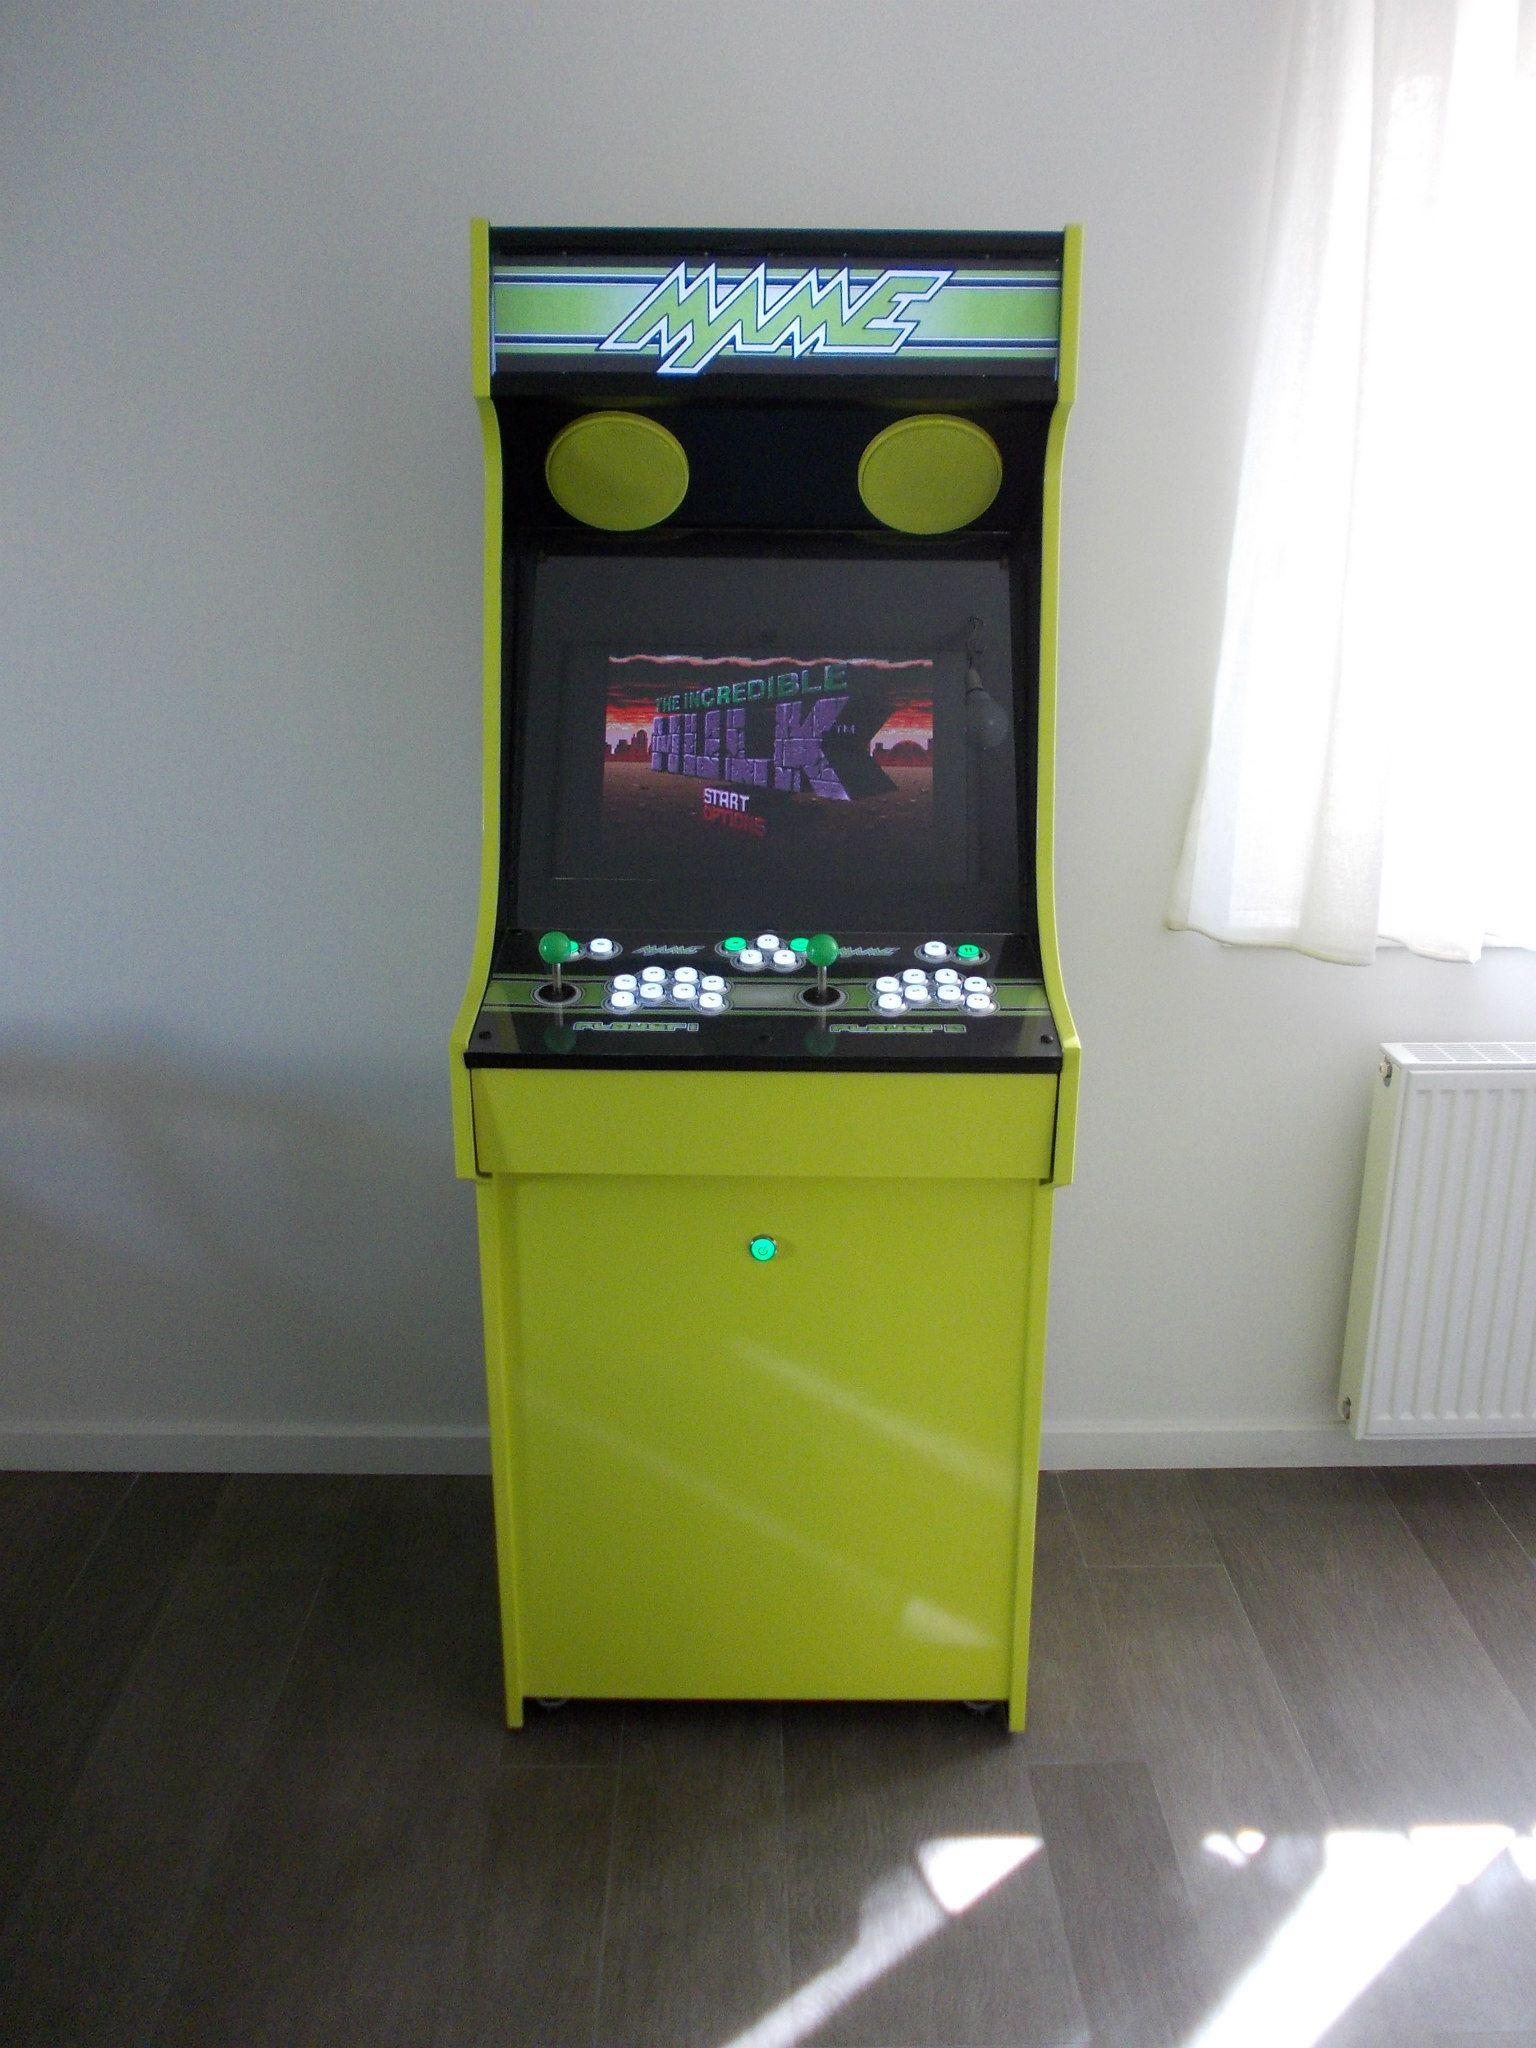 Arcade Numca Gr Stergios Dimou Sakellariou